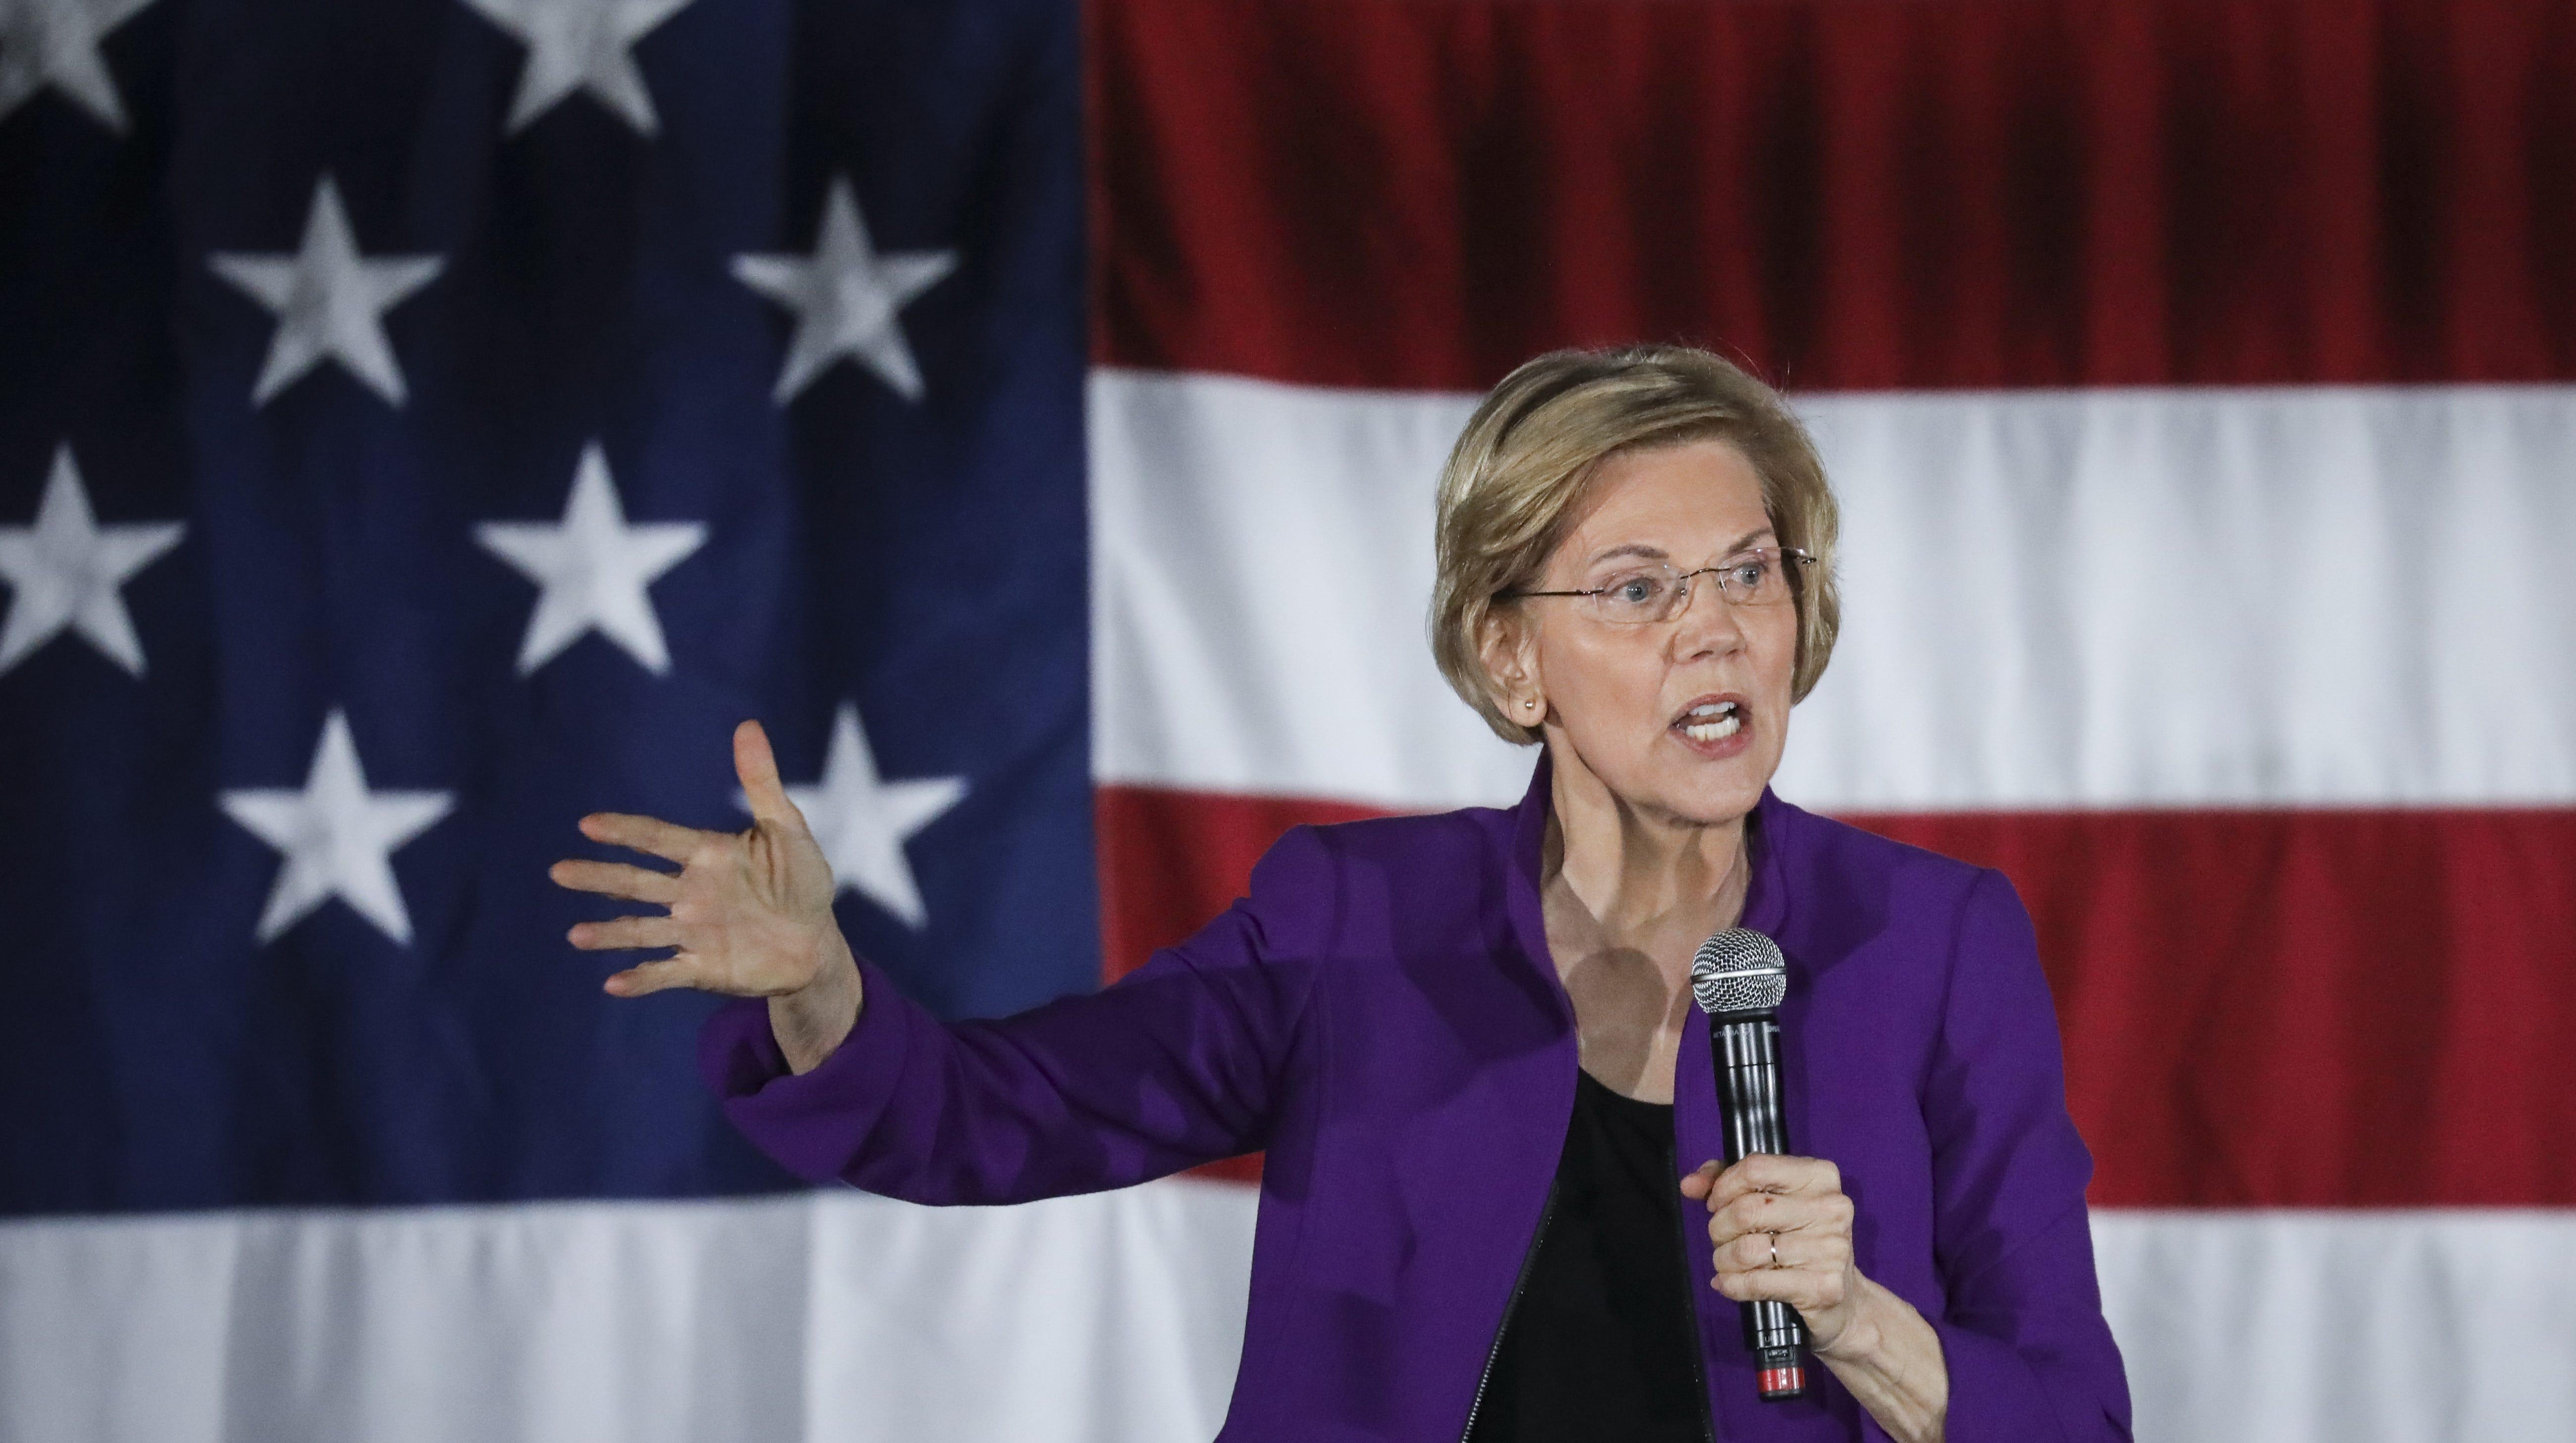 Sen. Elizabeth Warren, D-Mass. on March 8, 2019 in New York City.